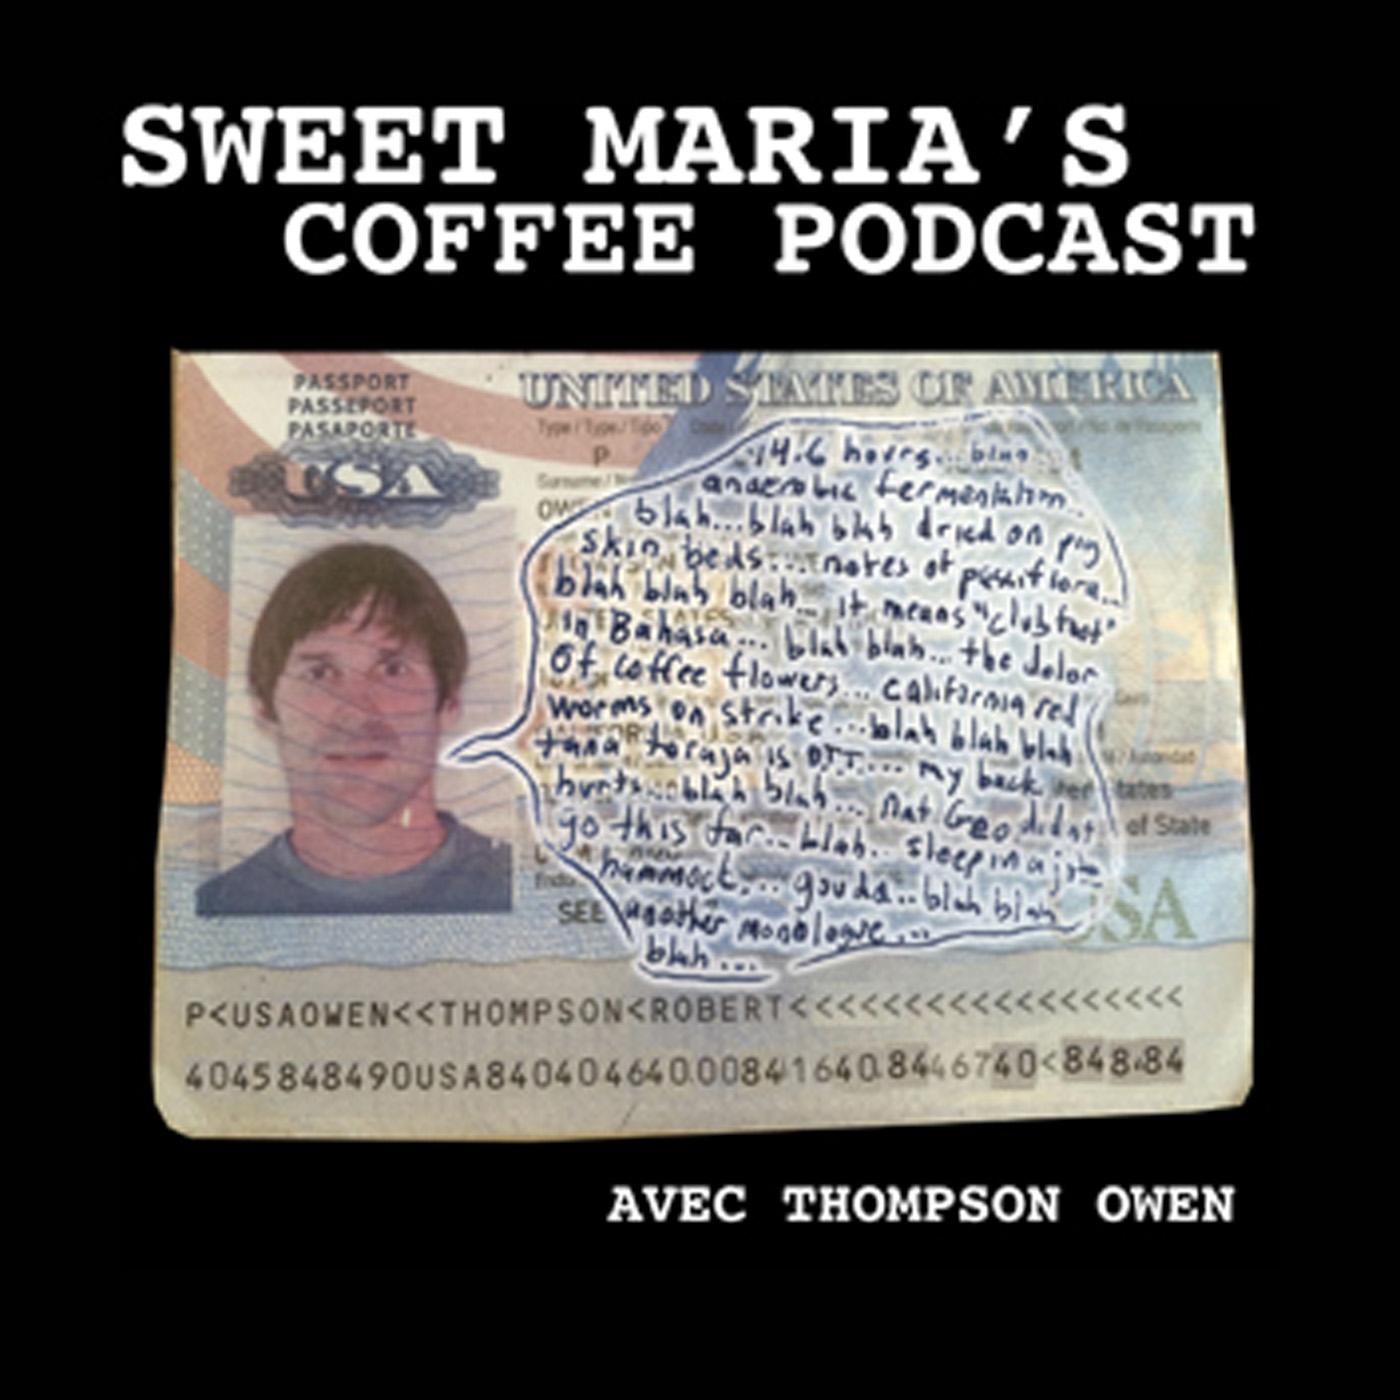 Sweet Maria's Coffee logo